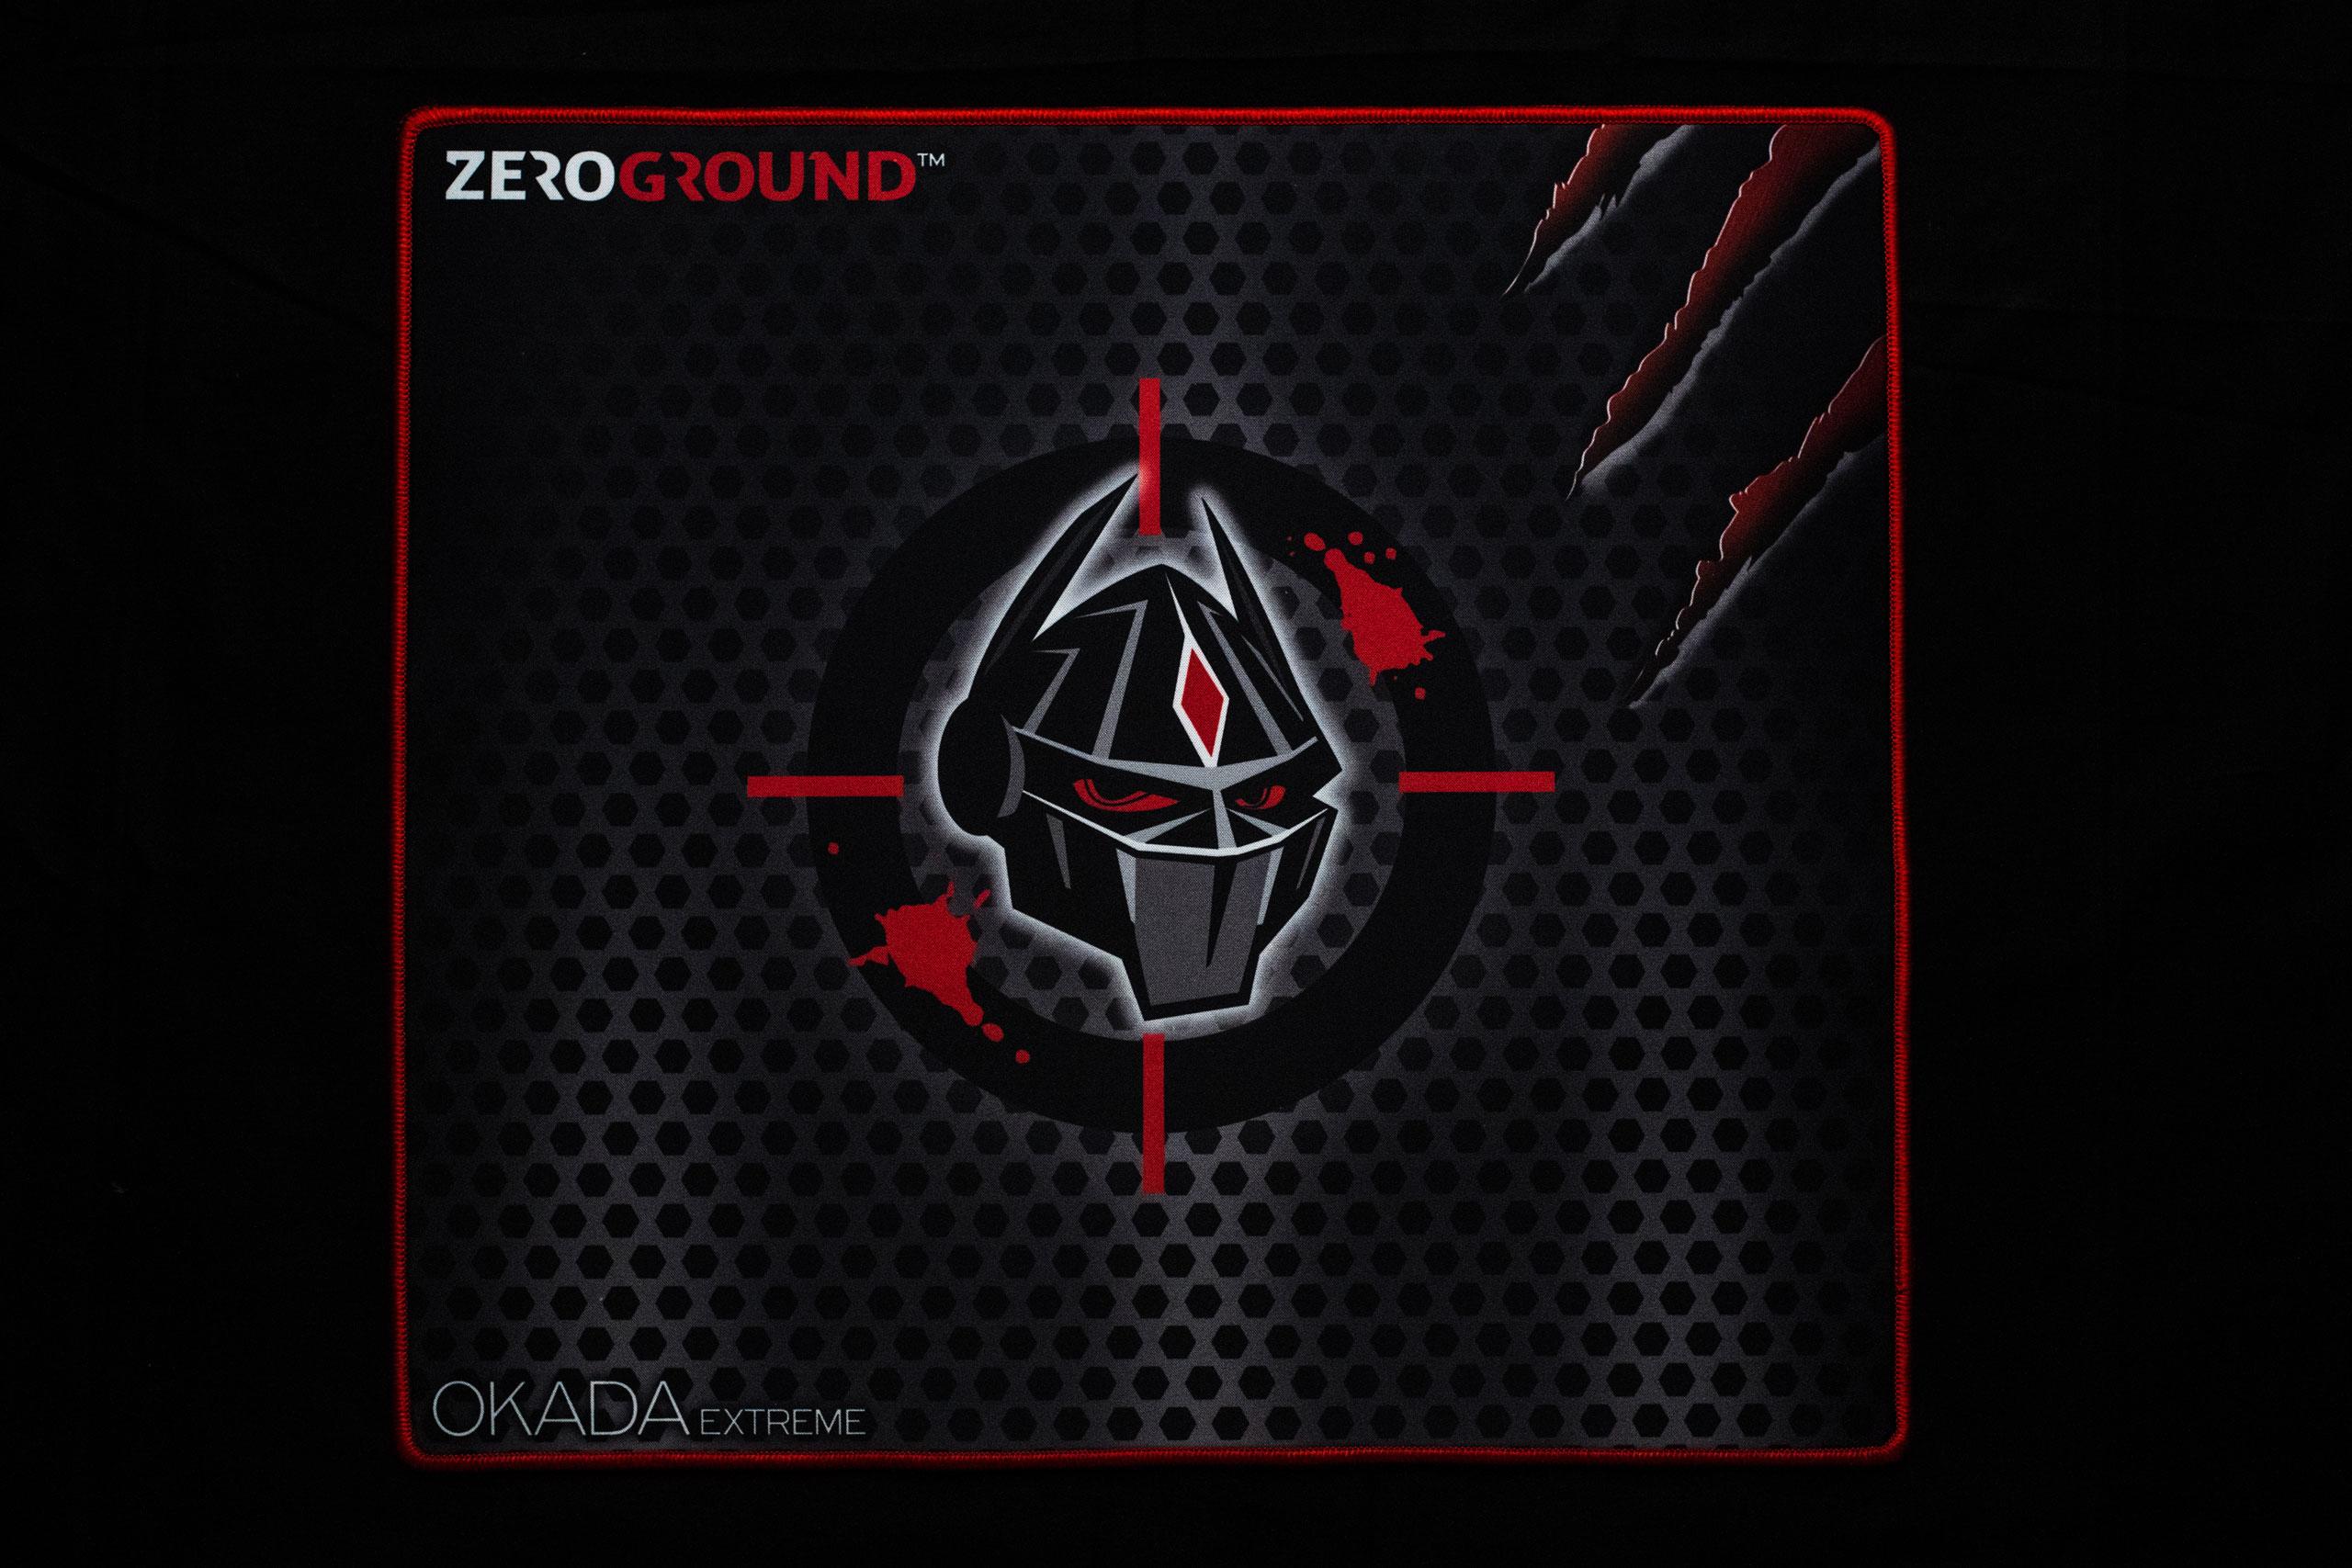 ZeroGround Okada 2.0 1